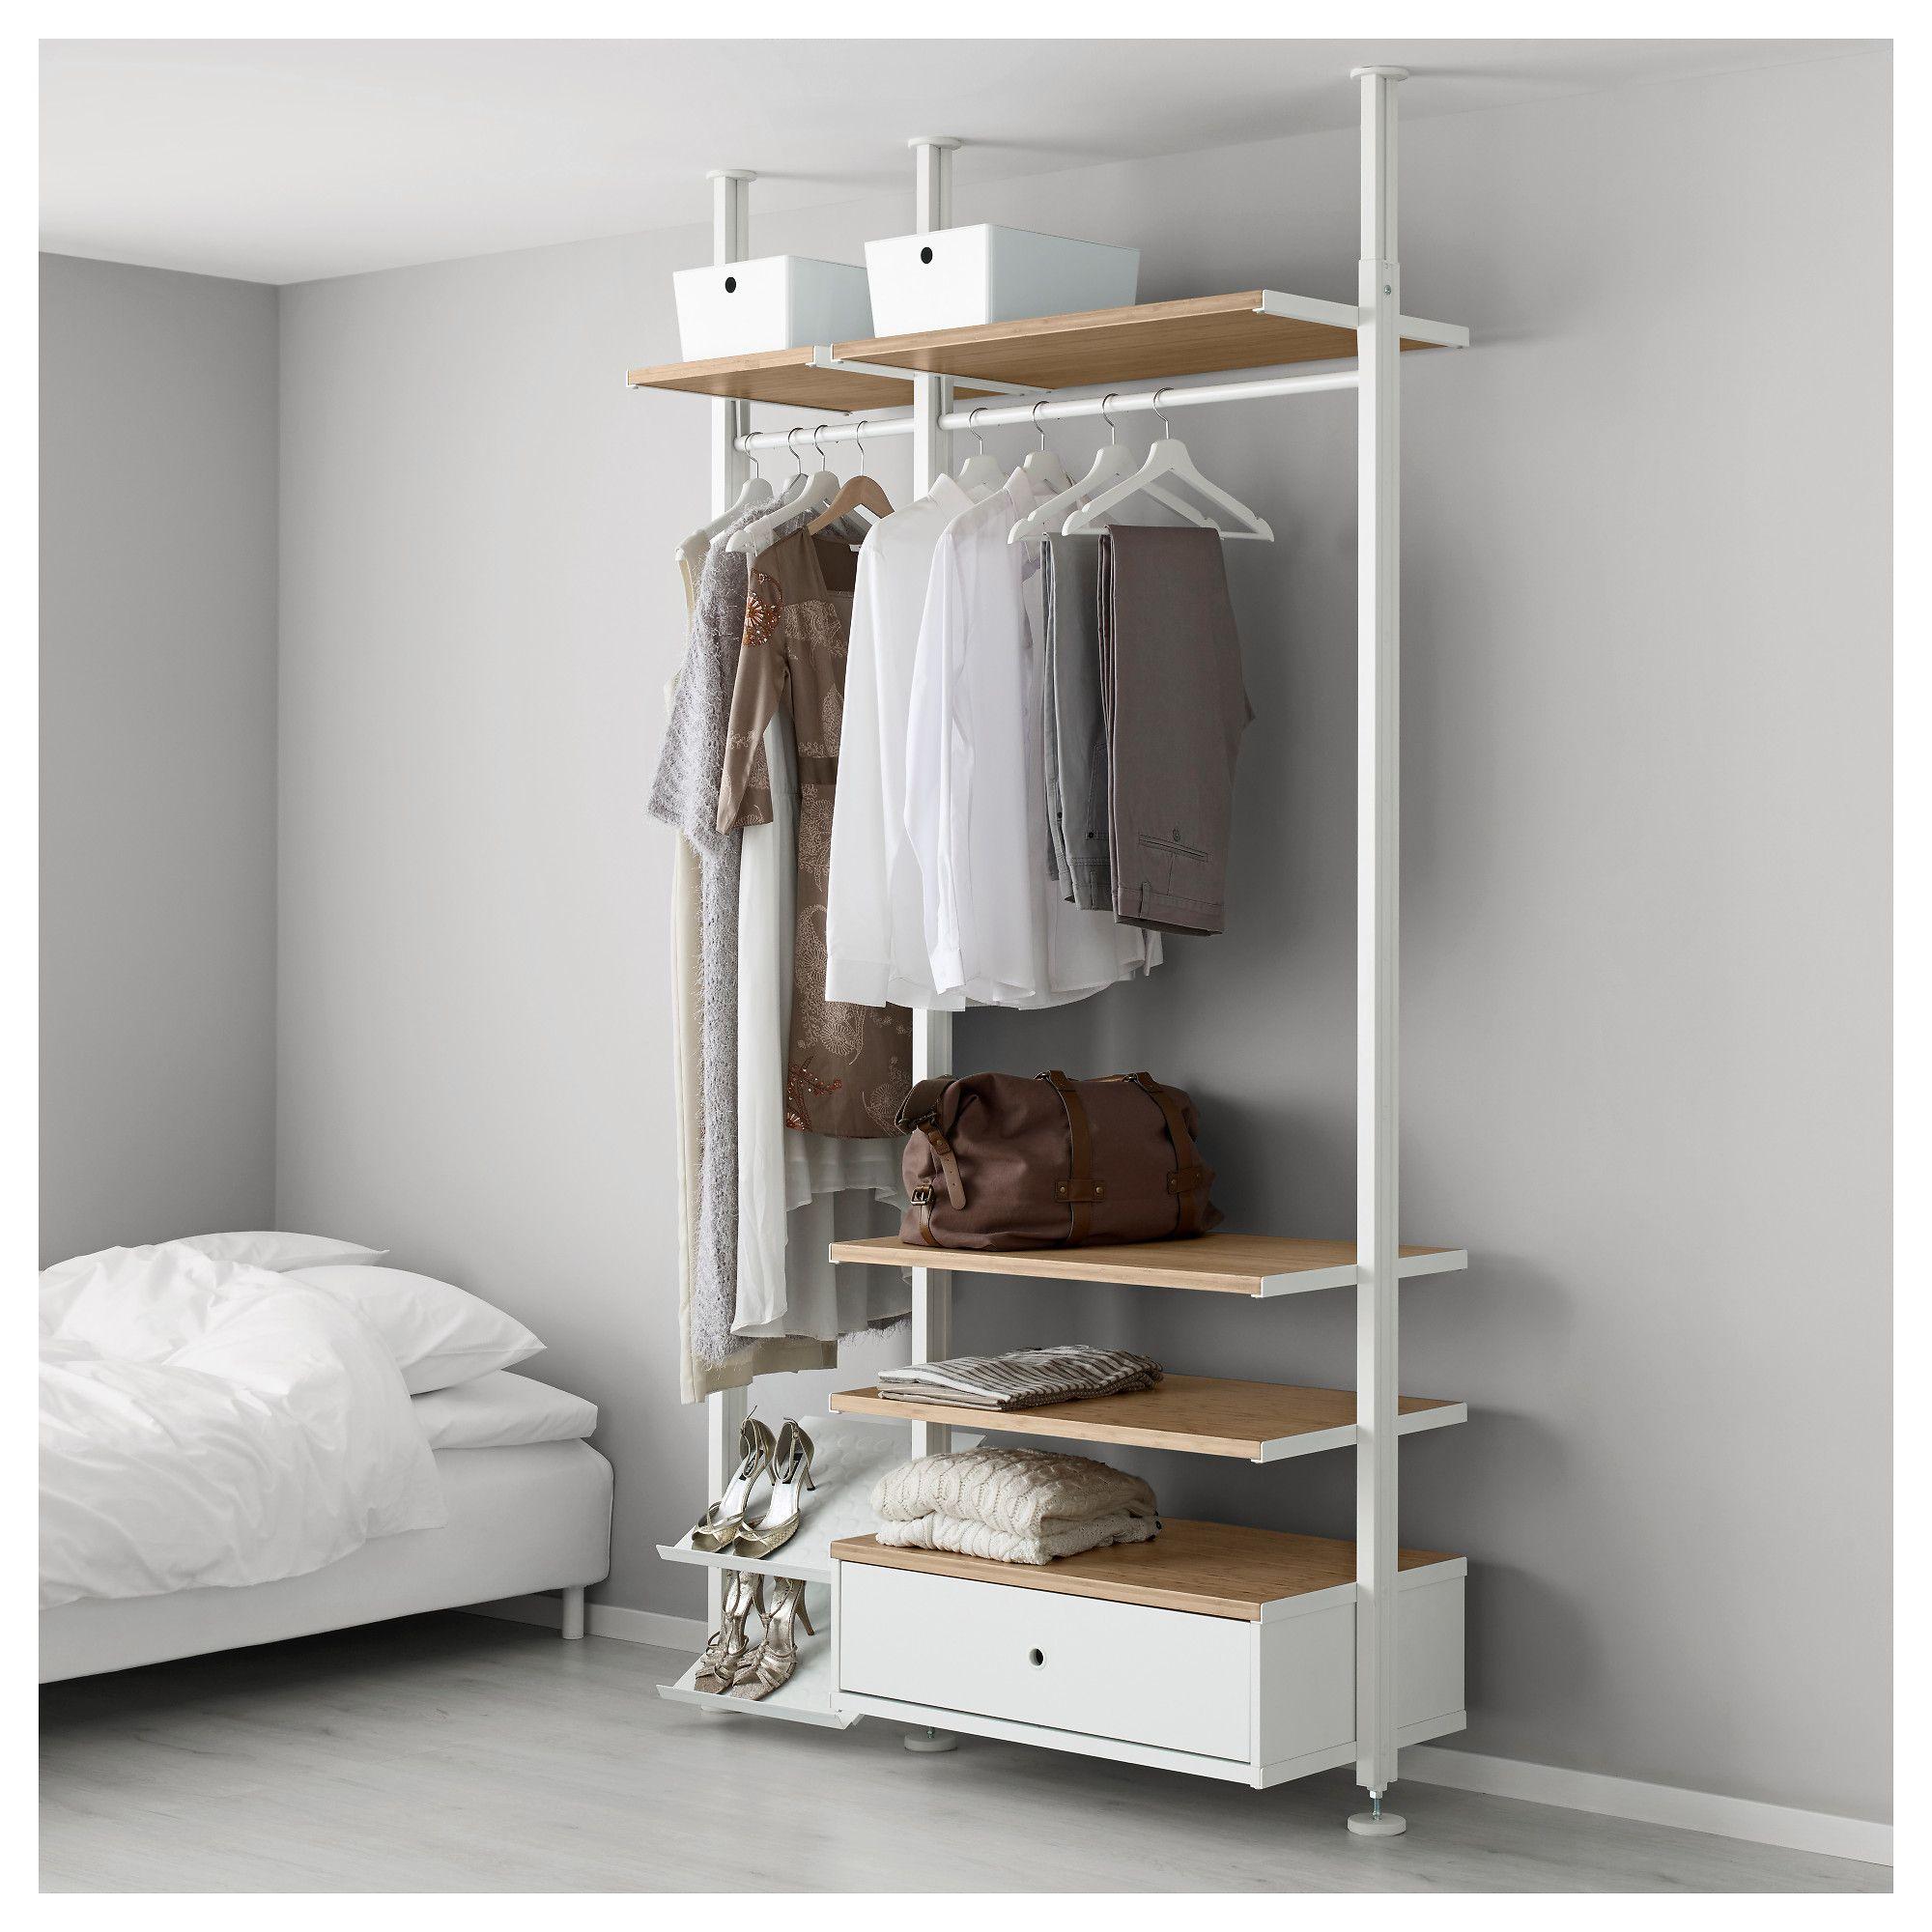 Best Elvarli 2 Section Shelving Unit White Bamboo In 2019 640 x 480